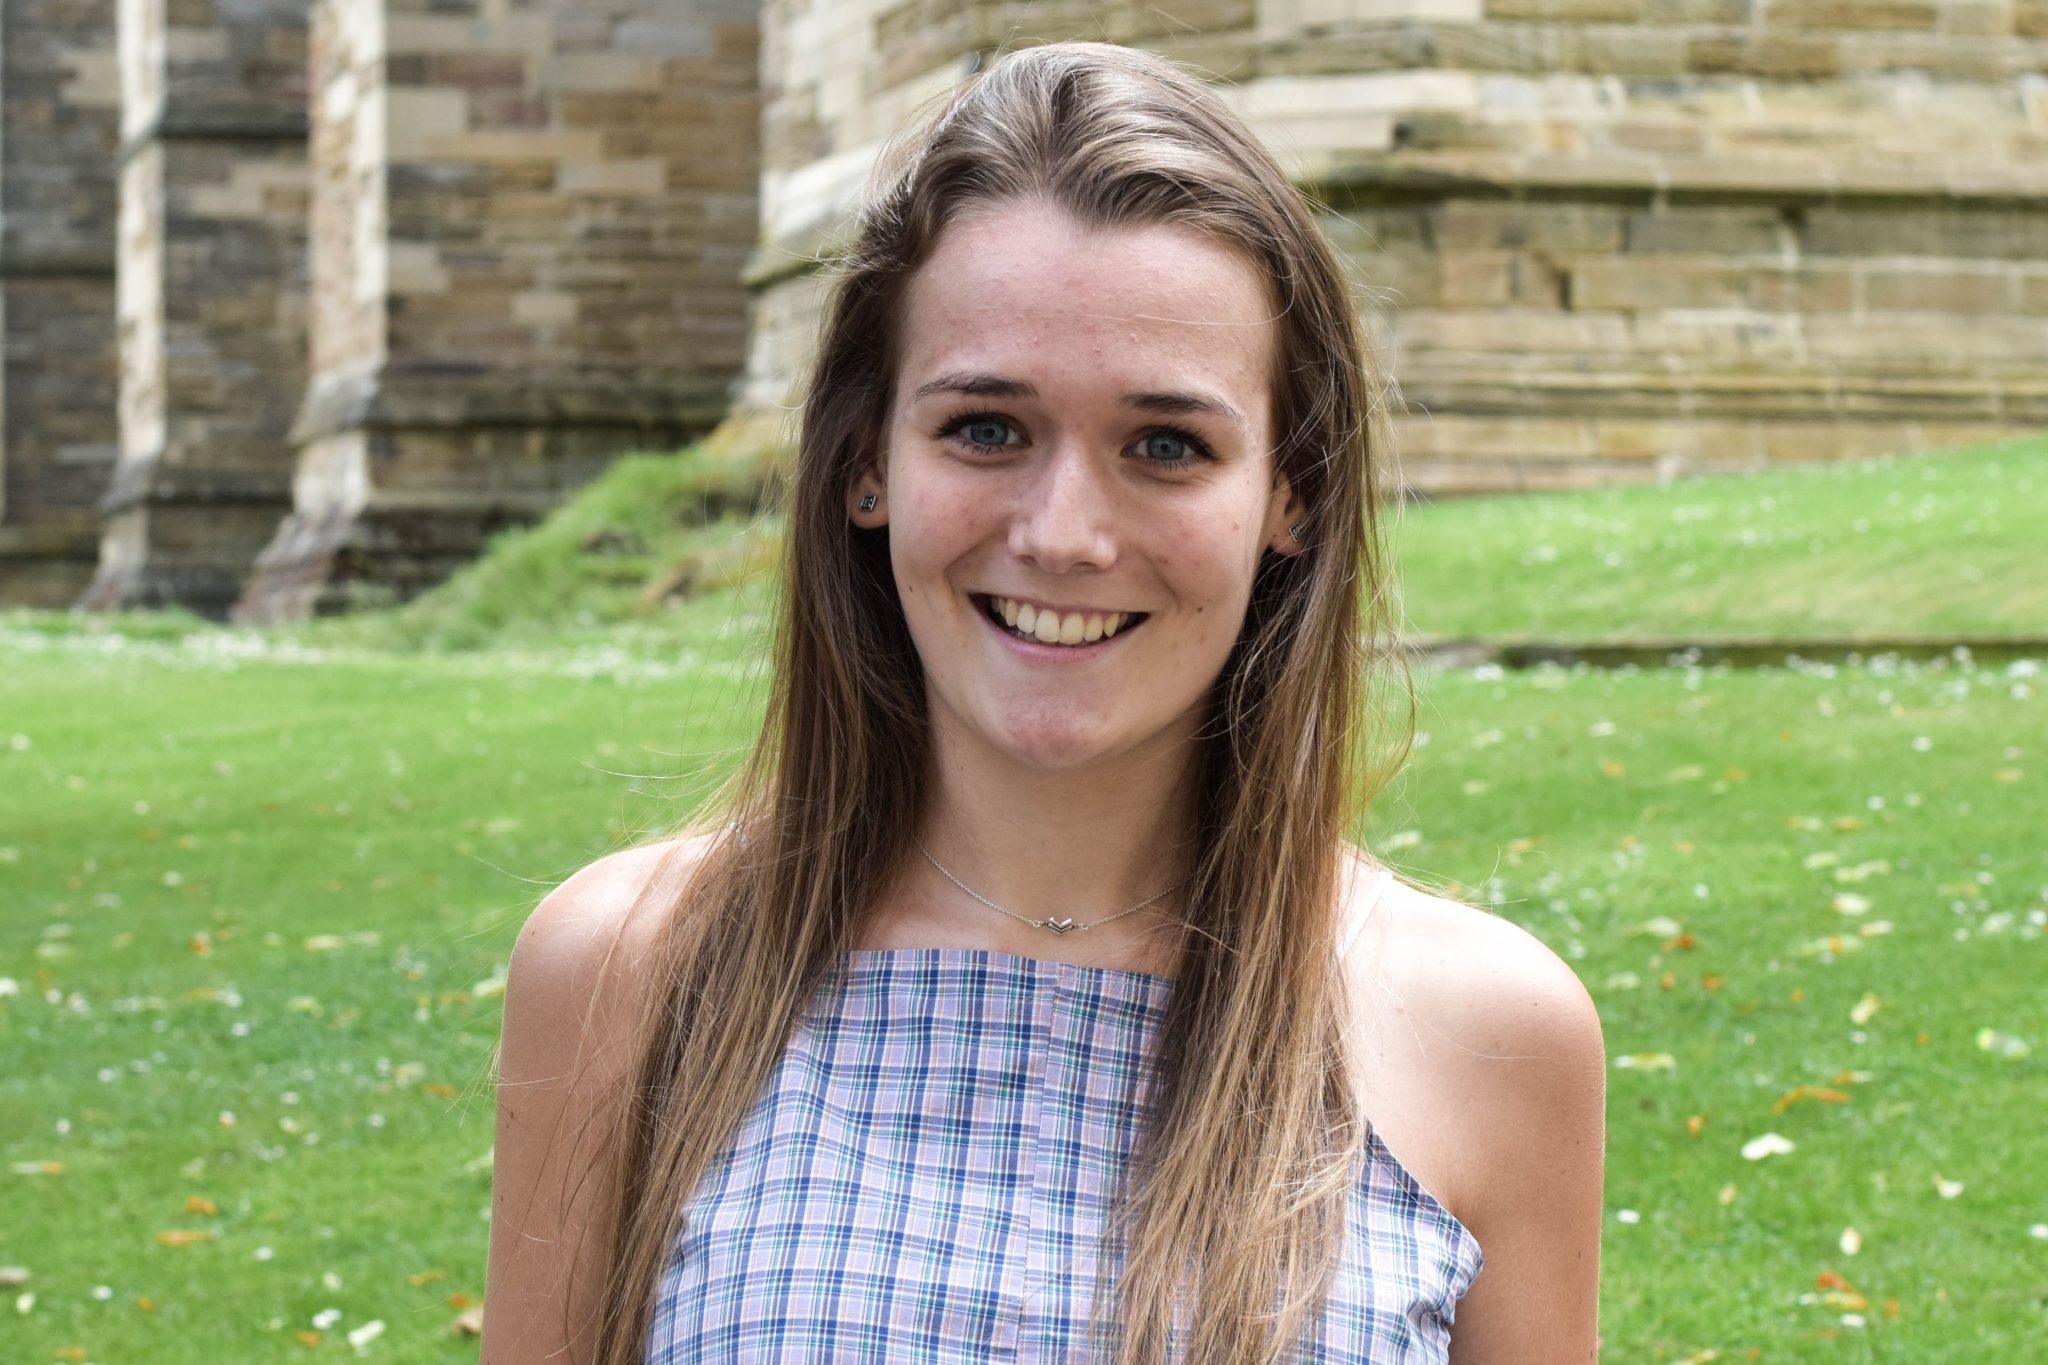 Emma-Louise Howell